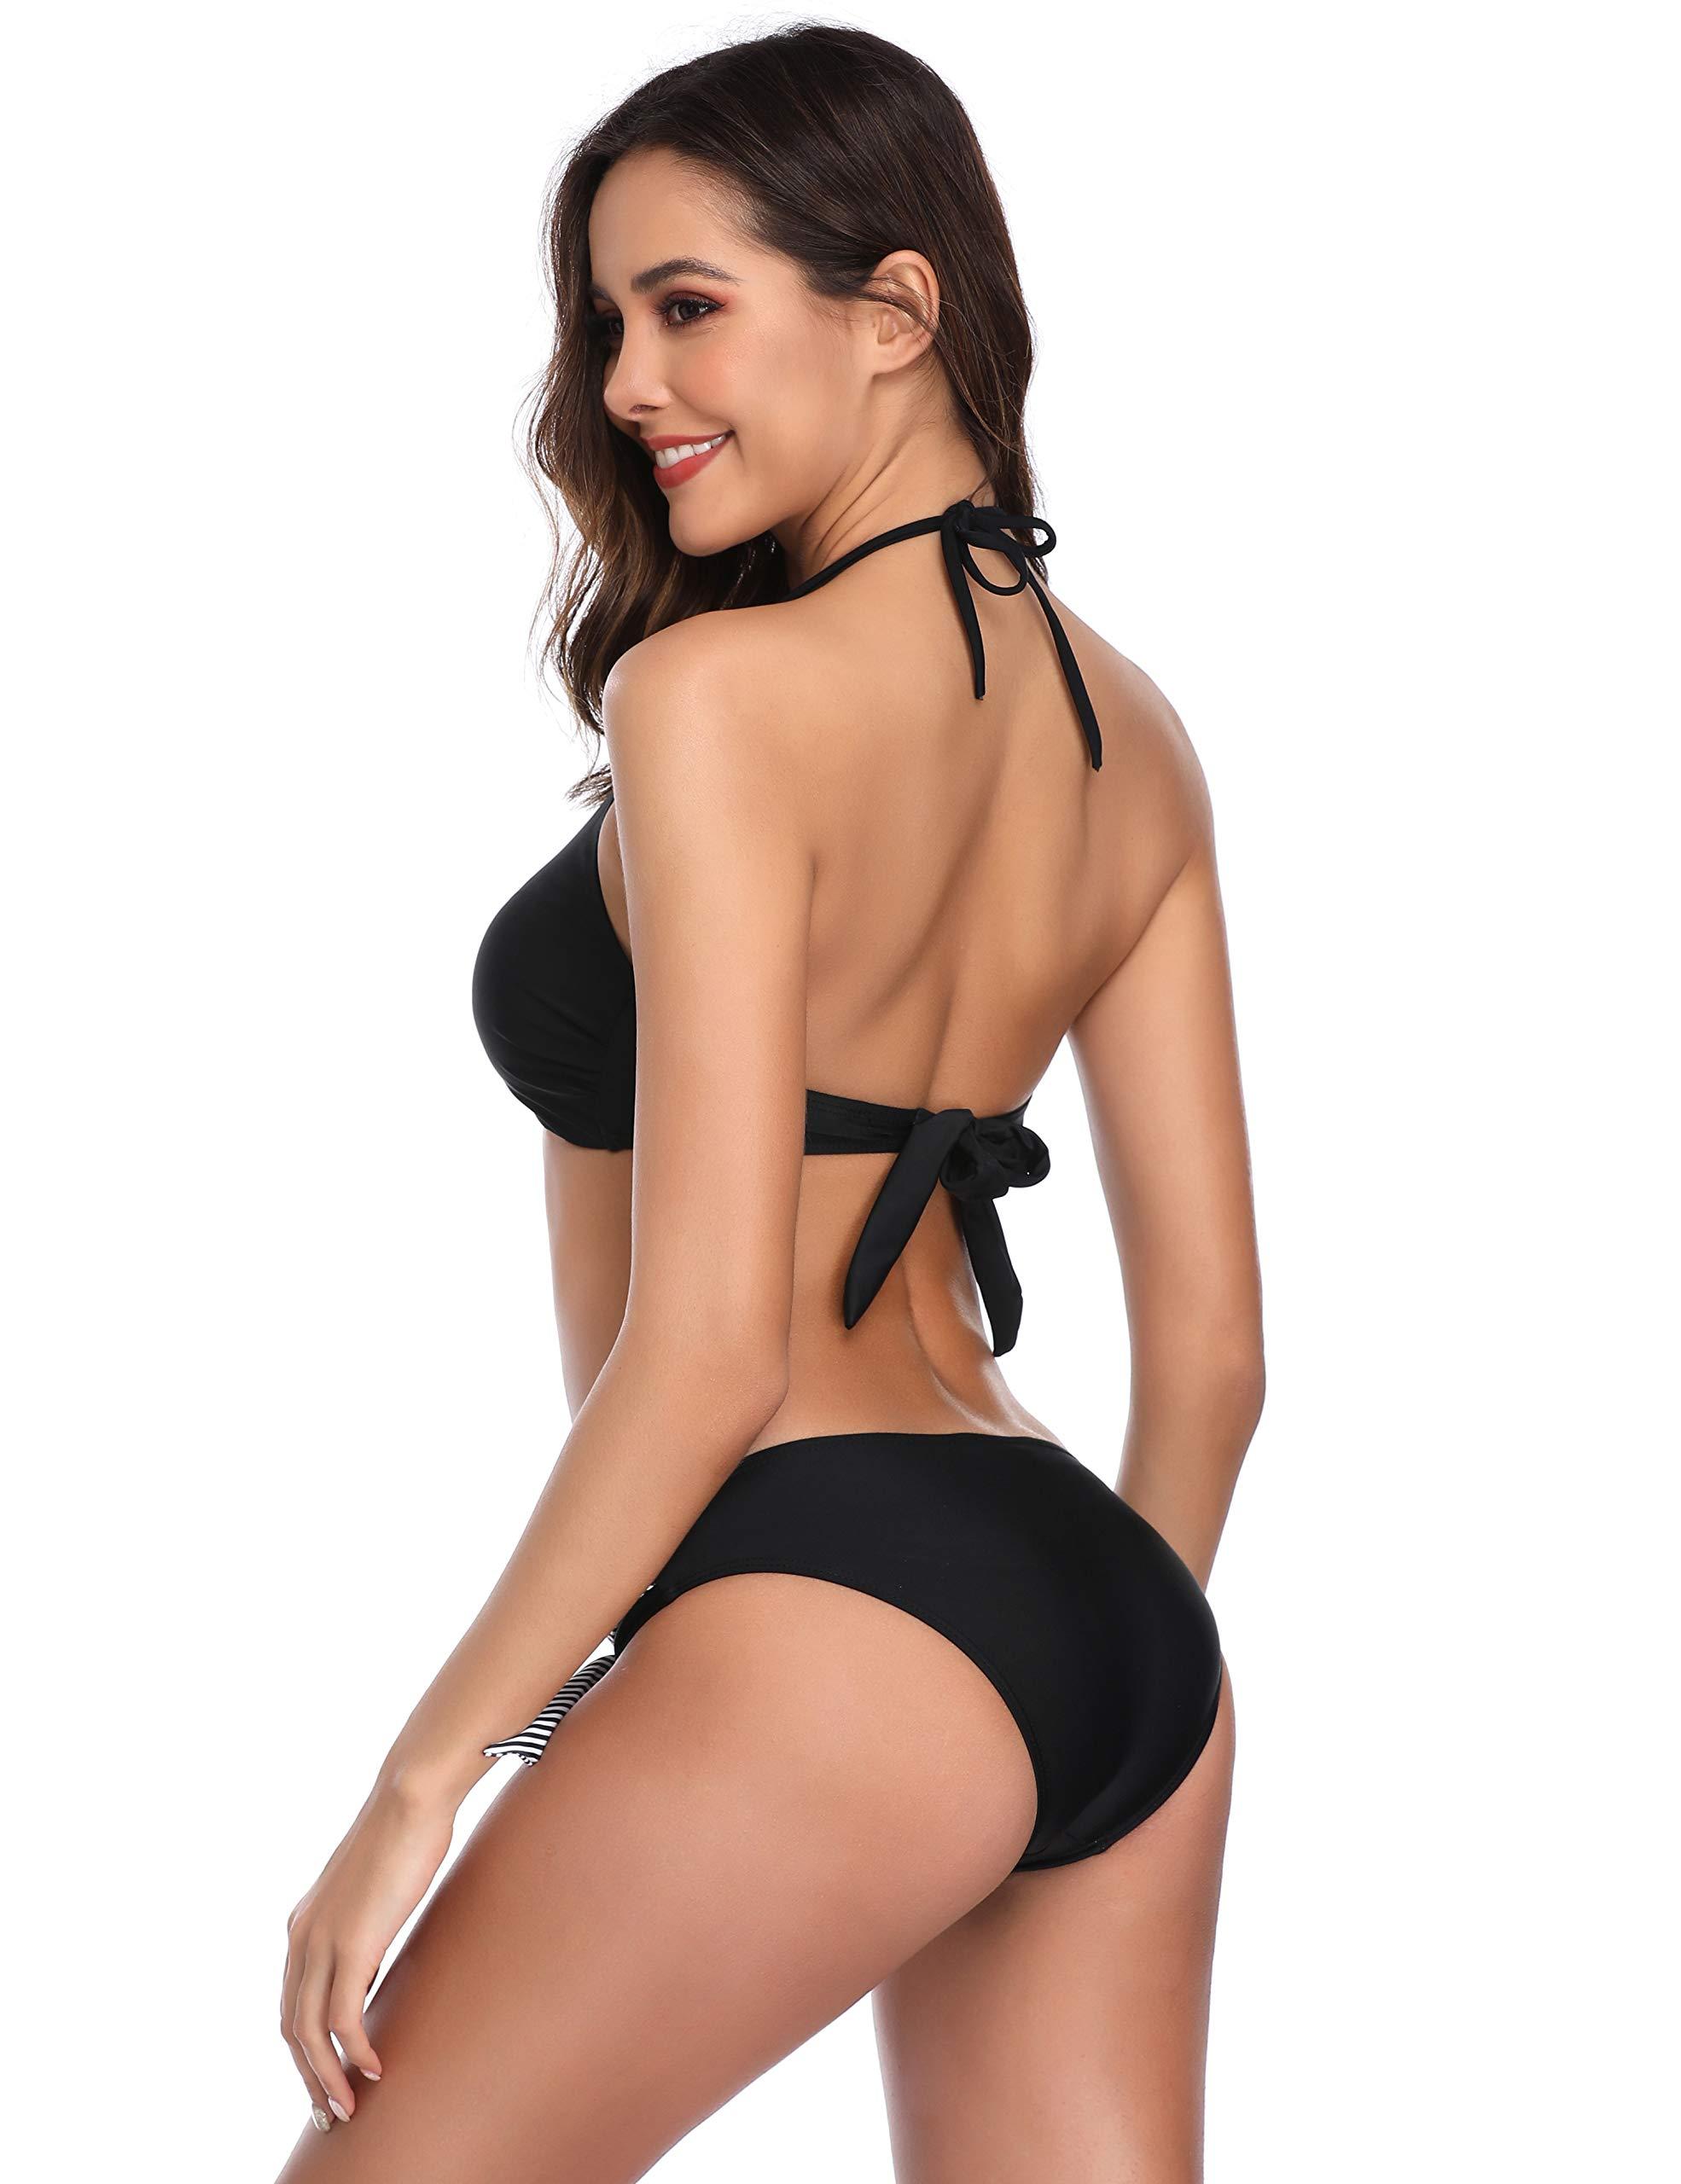 MarinaVida Women Bikini Set Sexy Hanging Neck 2 Piece Bikini Sets Swimsuits Low Waisted Bottom Bathing Suit